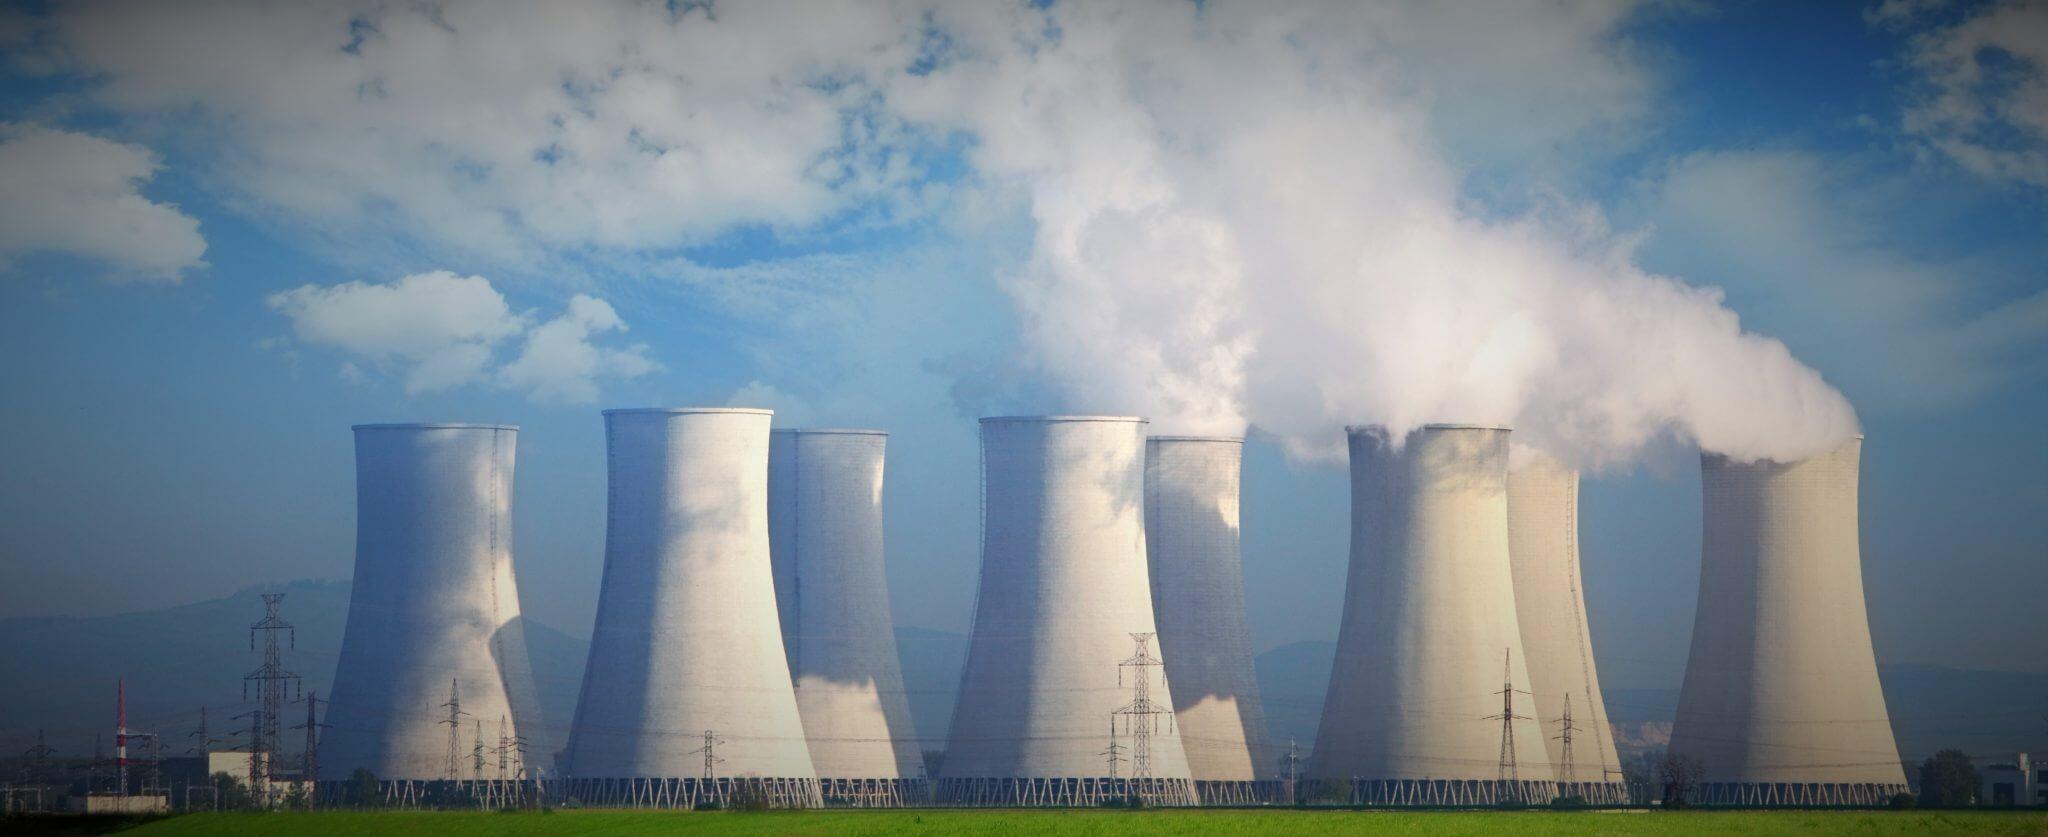 nuclearpowerpic_2